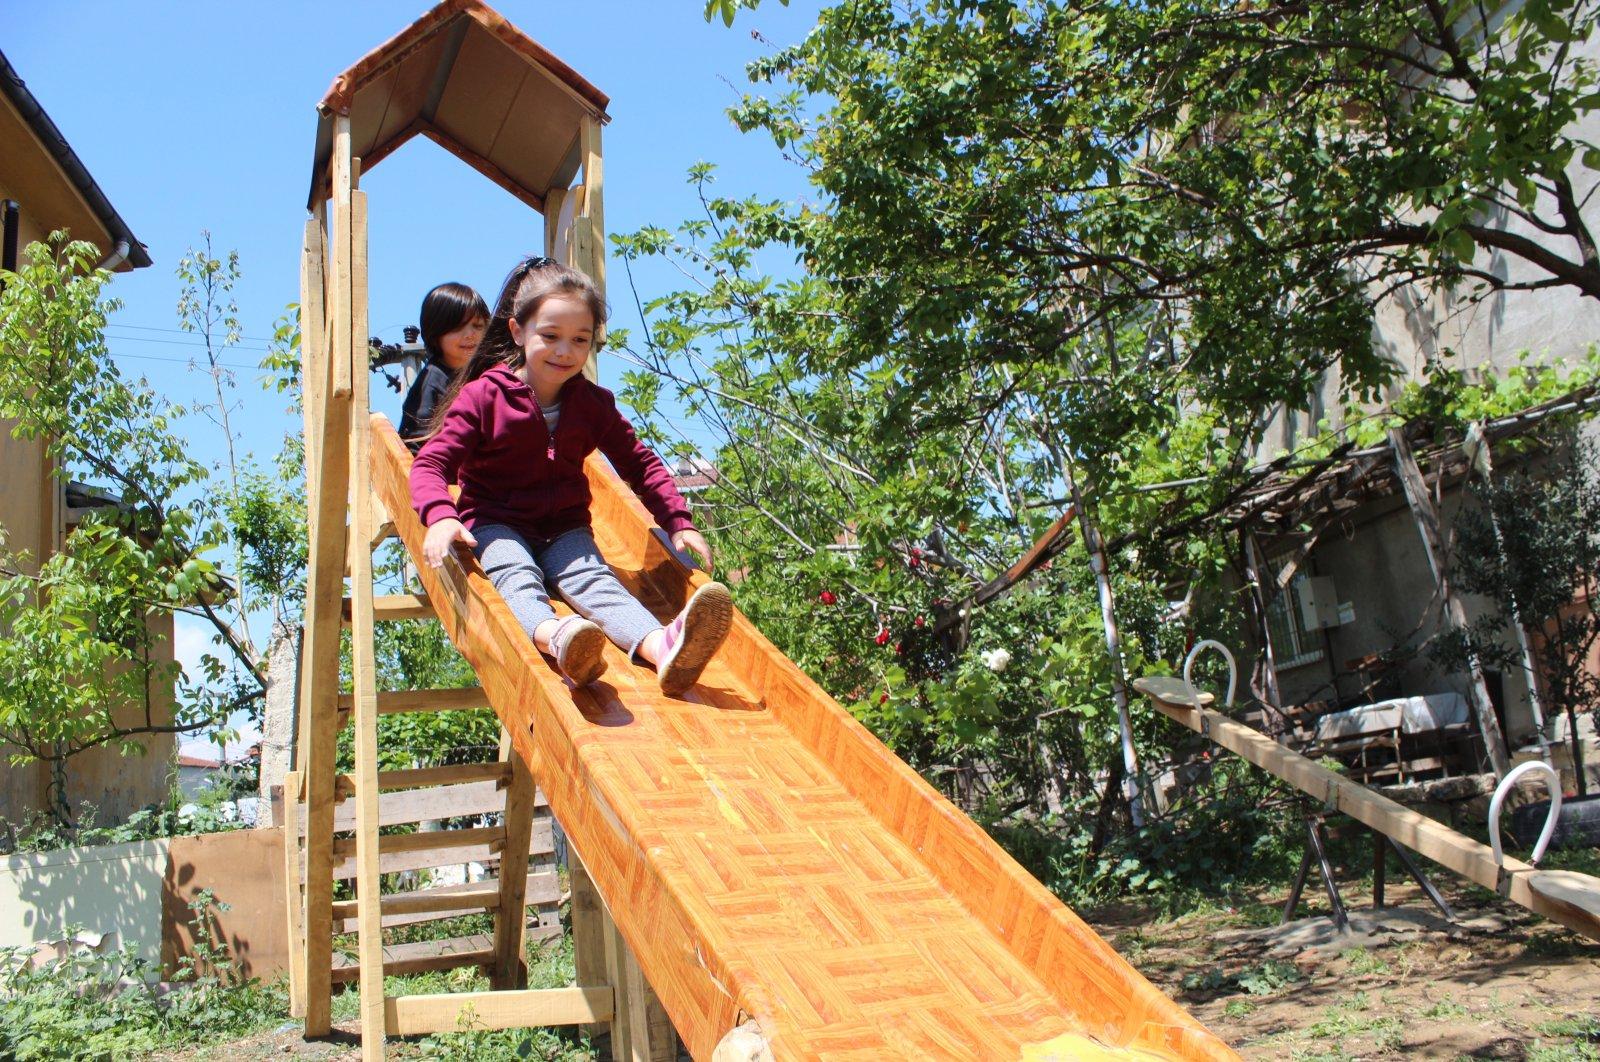 Children slide down a slide in the backyard of their house, in Kocaeli, northwestern Turkey, May 11, 2020. (İHA PHOTO)